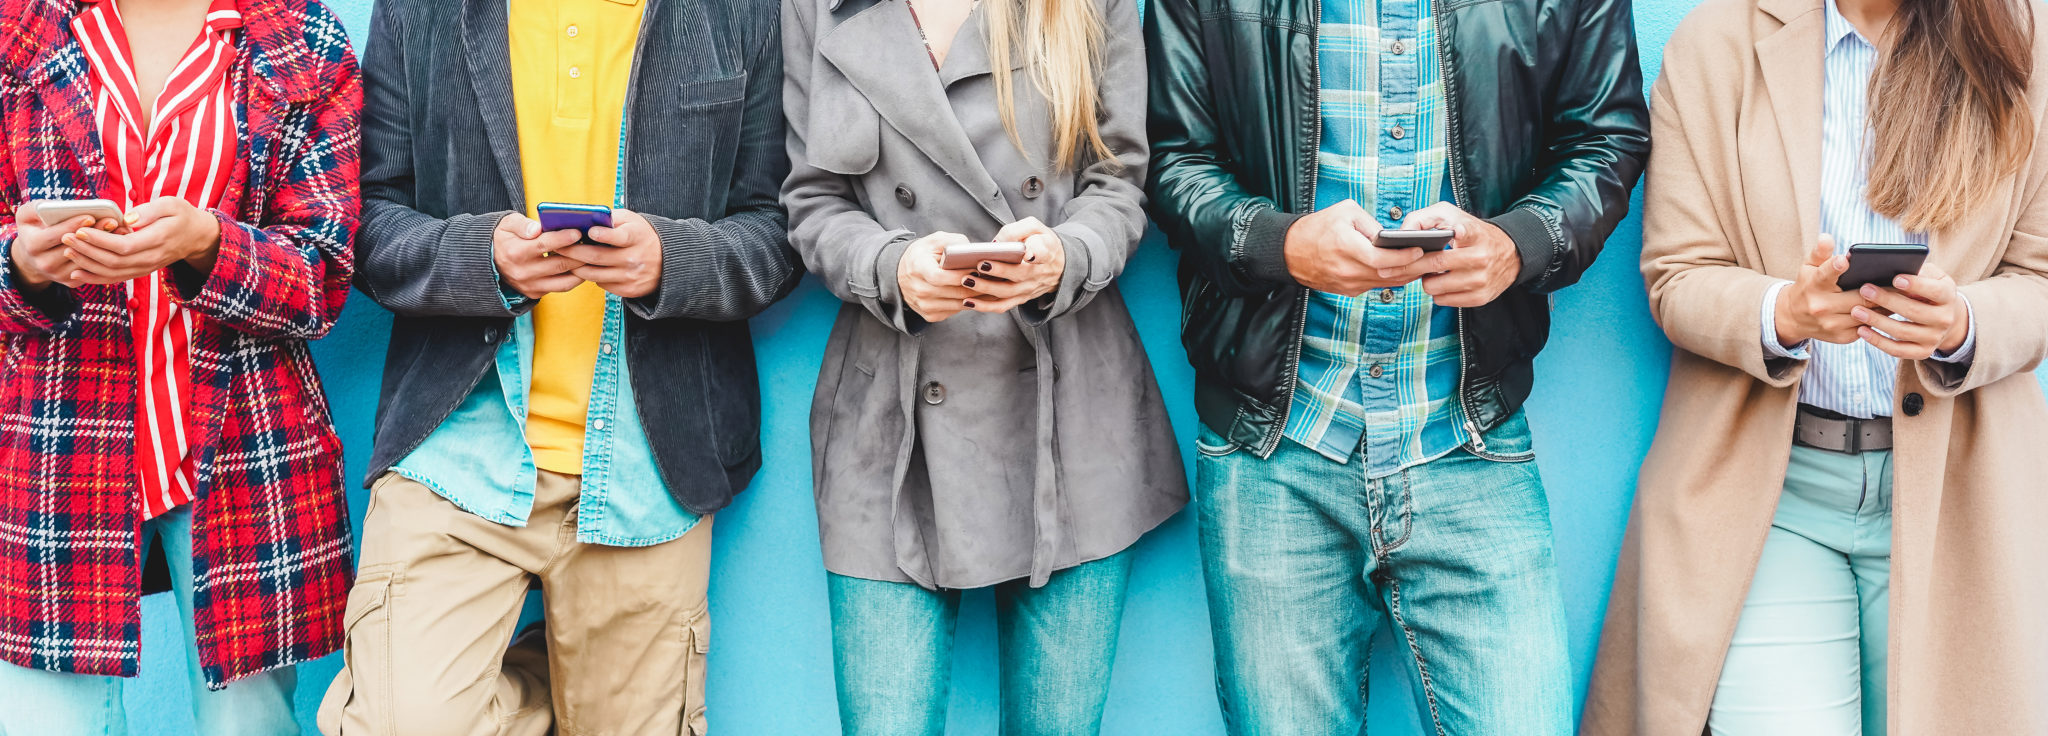 Group,Of,Friends,Using,Smart,Mobile,Phones,App,-,Teenagers